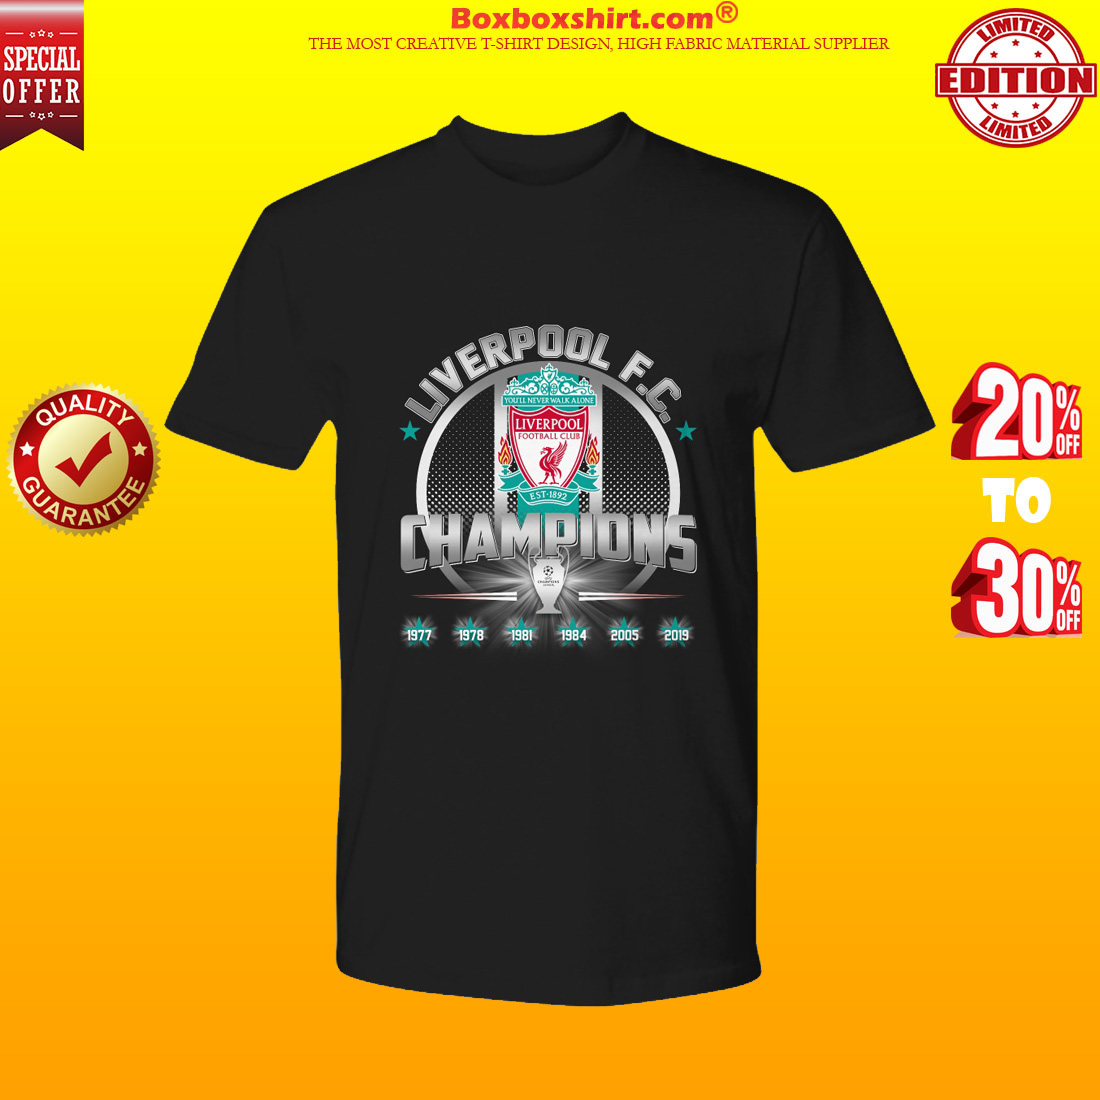 Liverpool FC Champions 2019 premium tee shirt